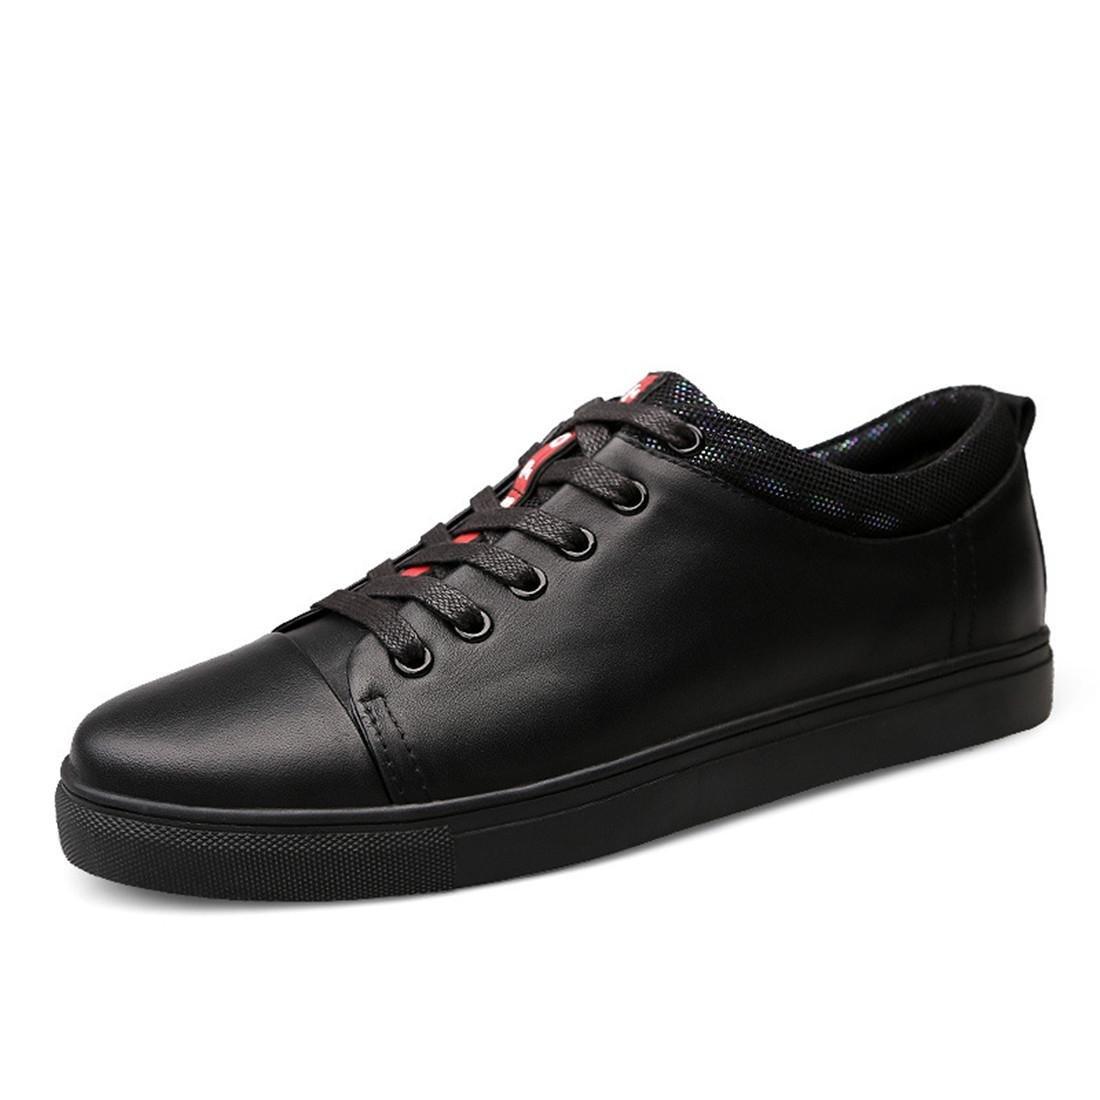 Herren Mode Freizeit Lederschuhe Lässige Schuhe Rutschfest Flache Schuhe Werkzeugschuhe Ausbilder EUR GRÖSSE 39-45